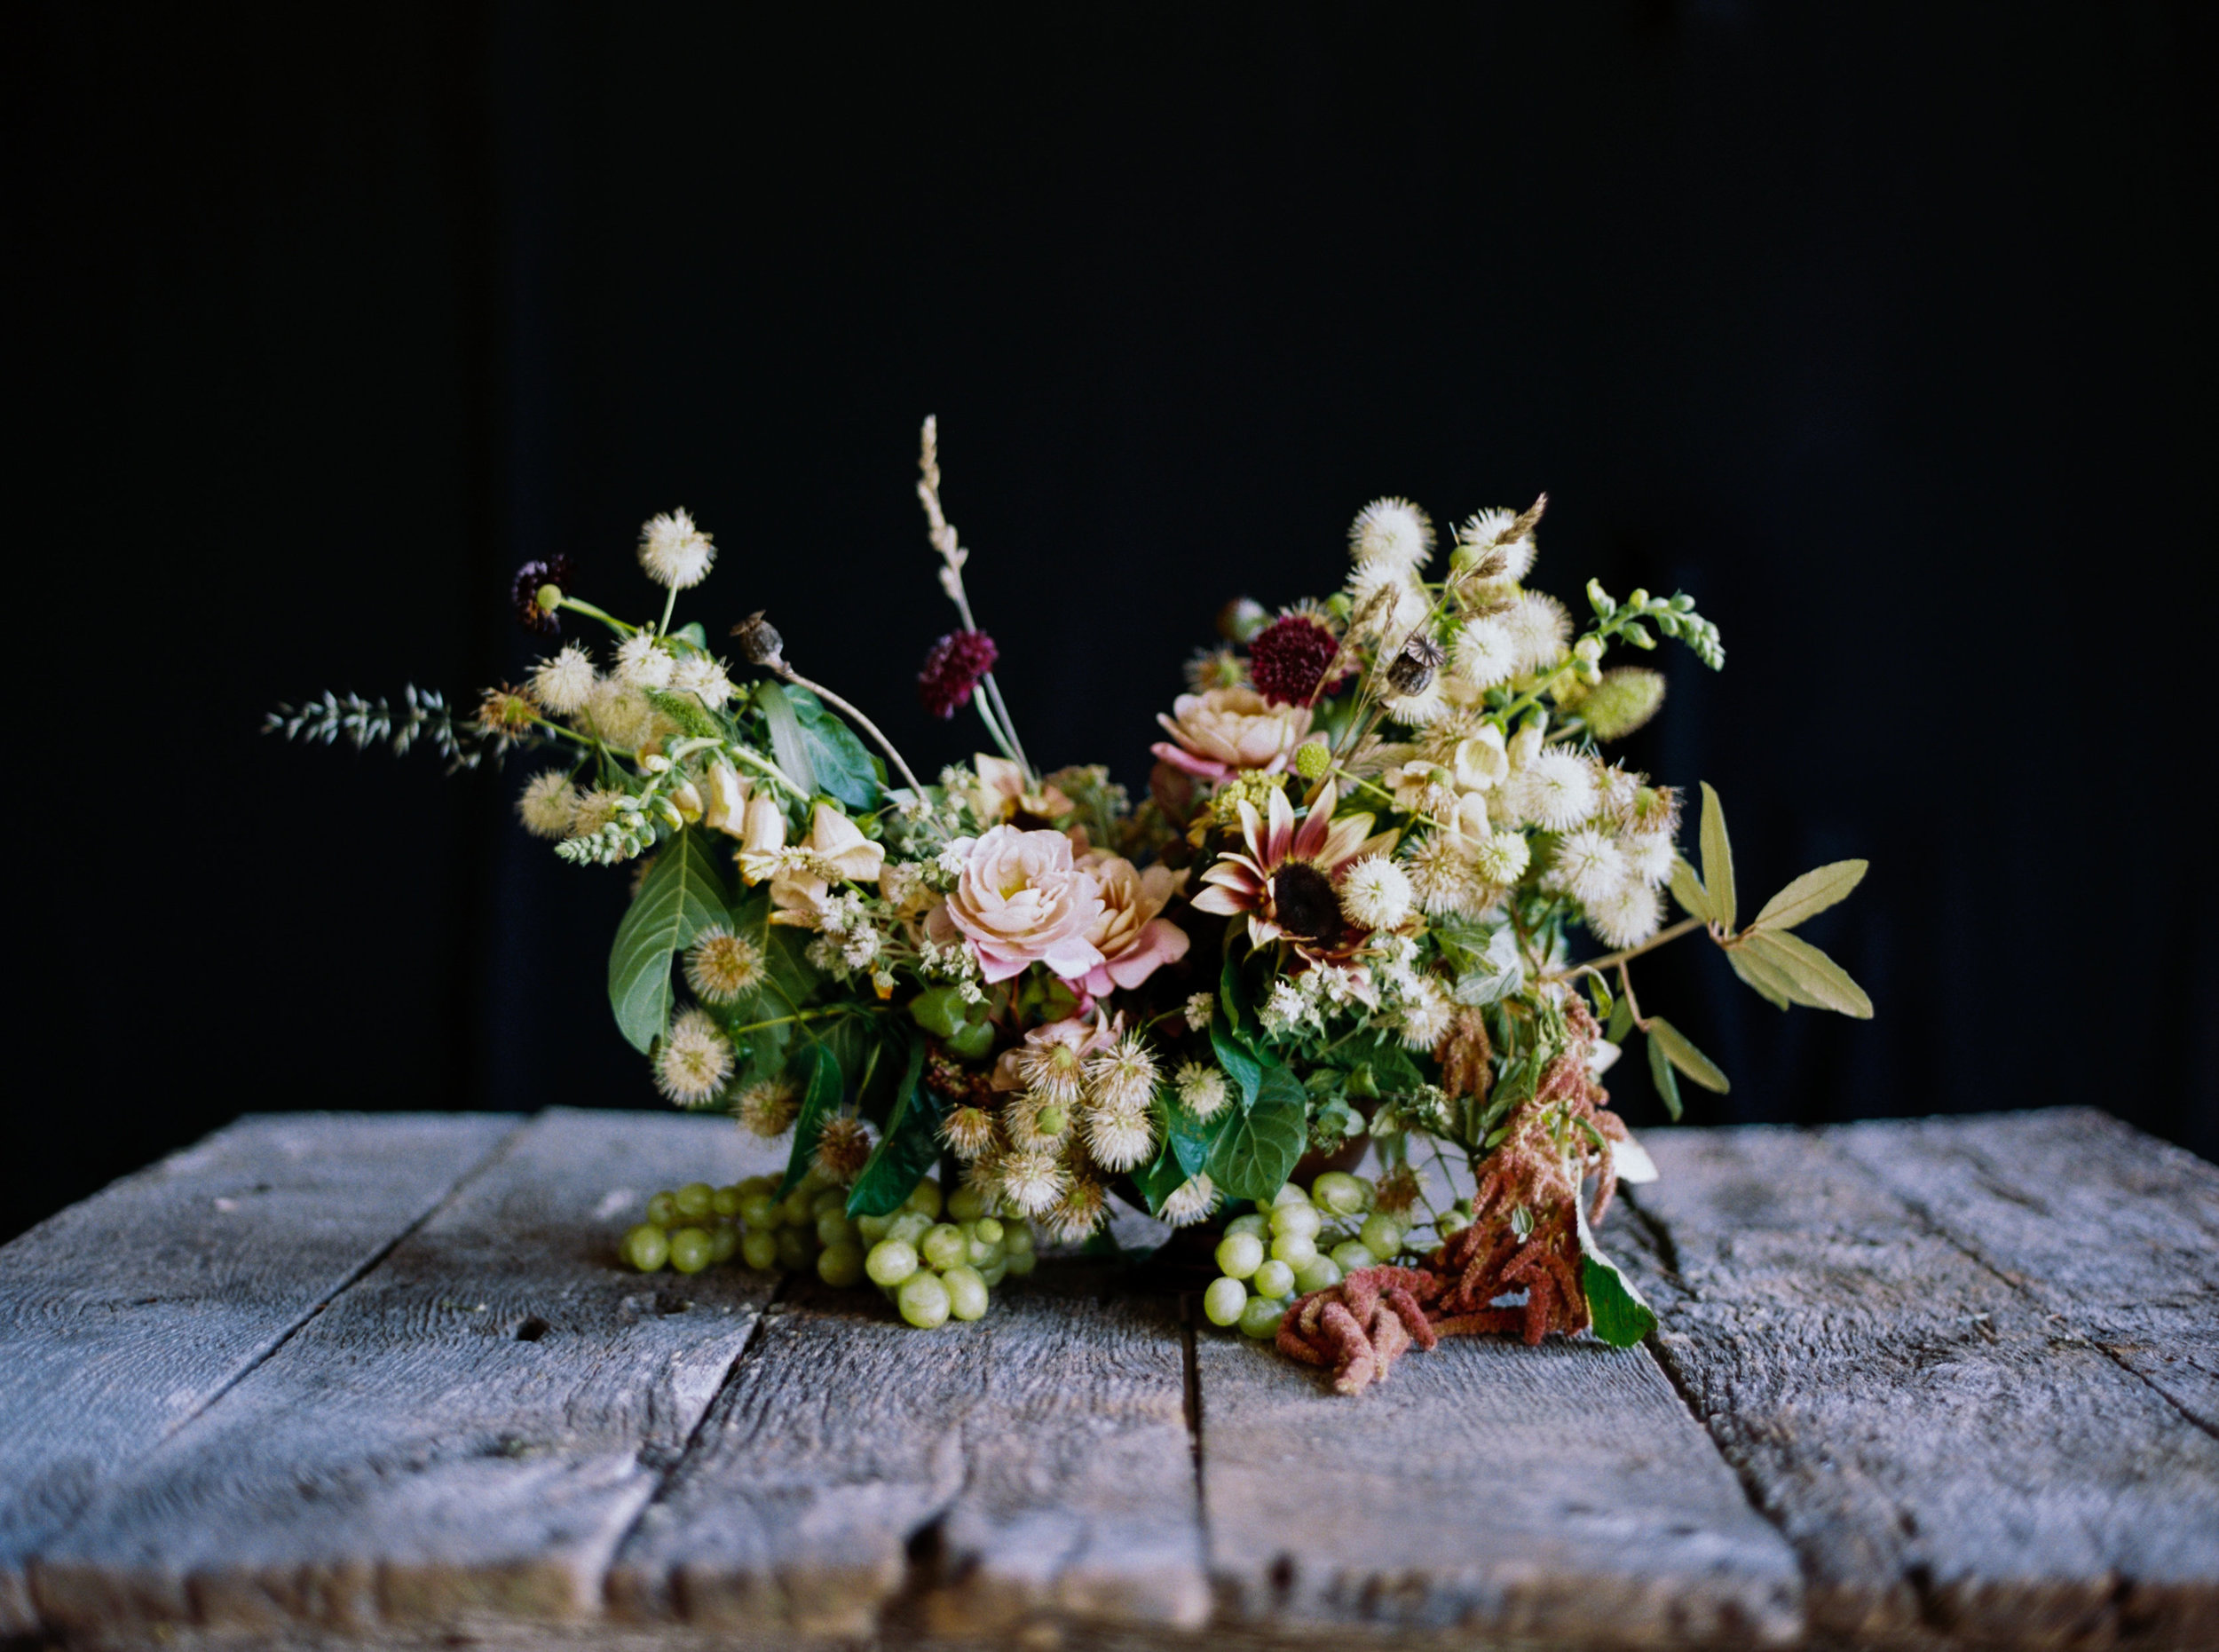 Editorial floral design